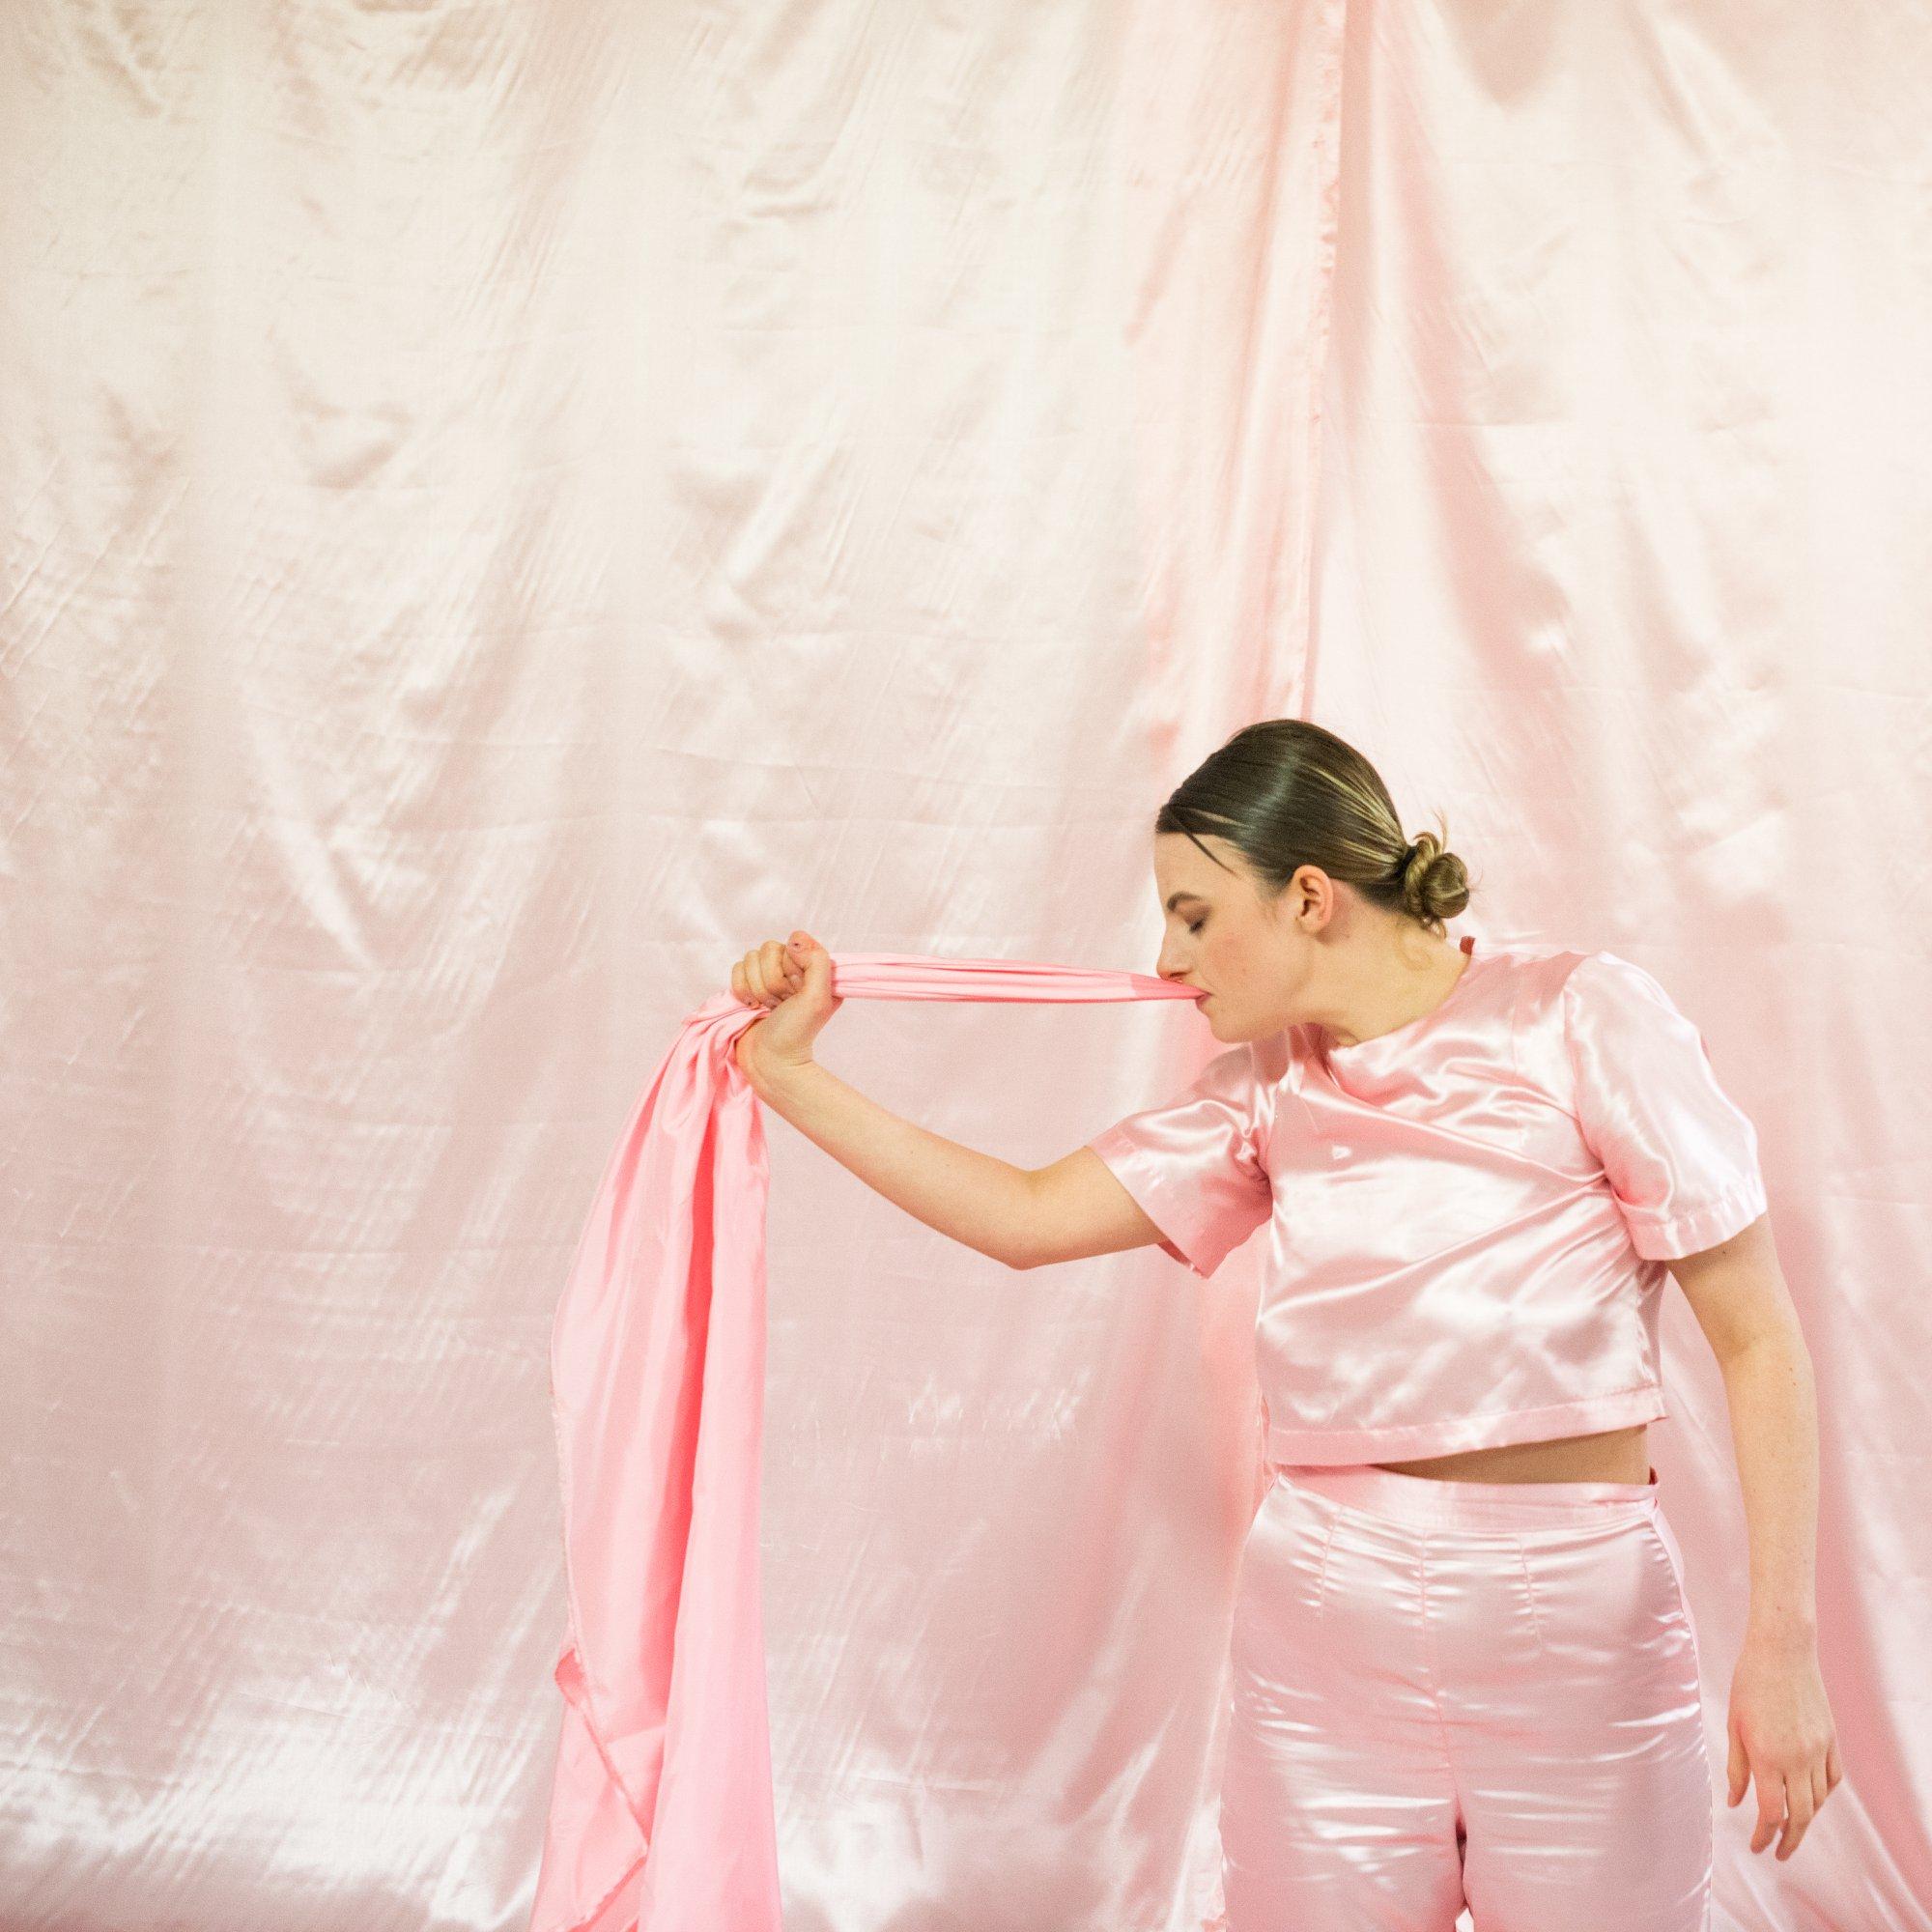 Pull, Pack, Polish 2 hour Performance, Stryx Gallery, Birmingham